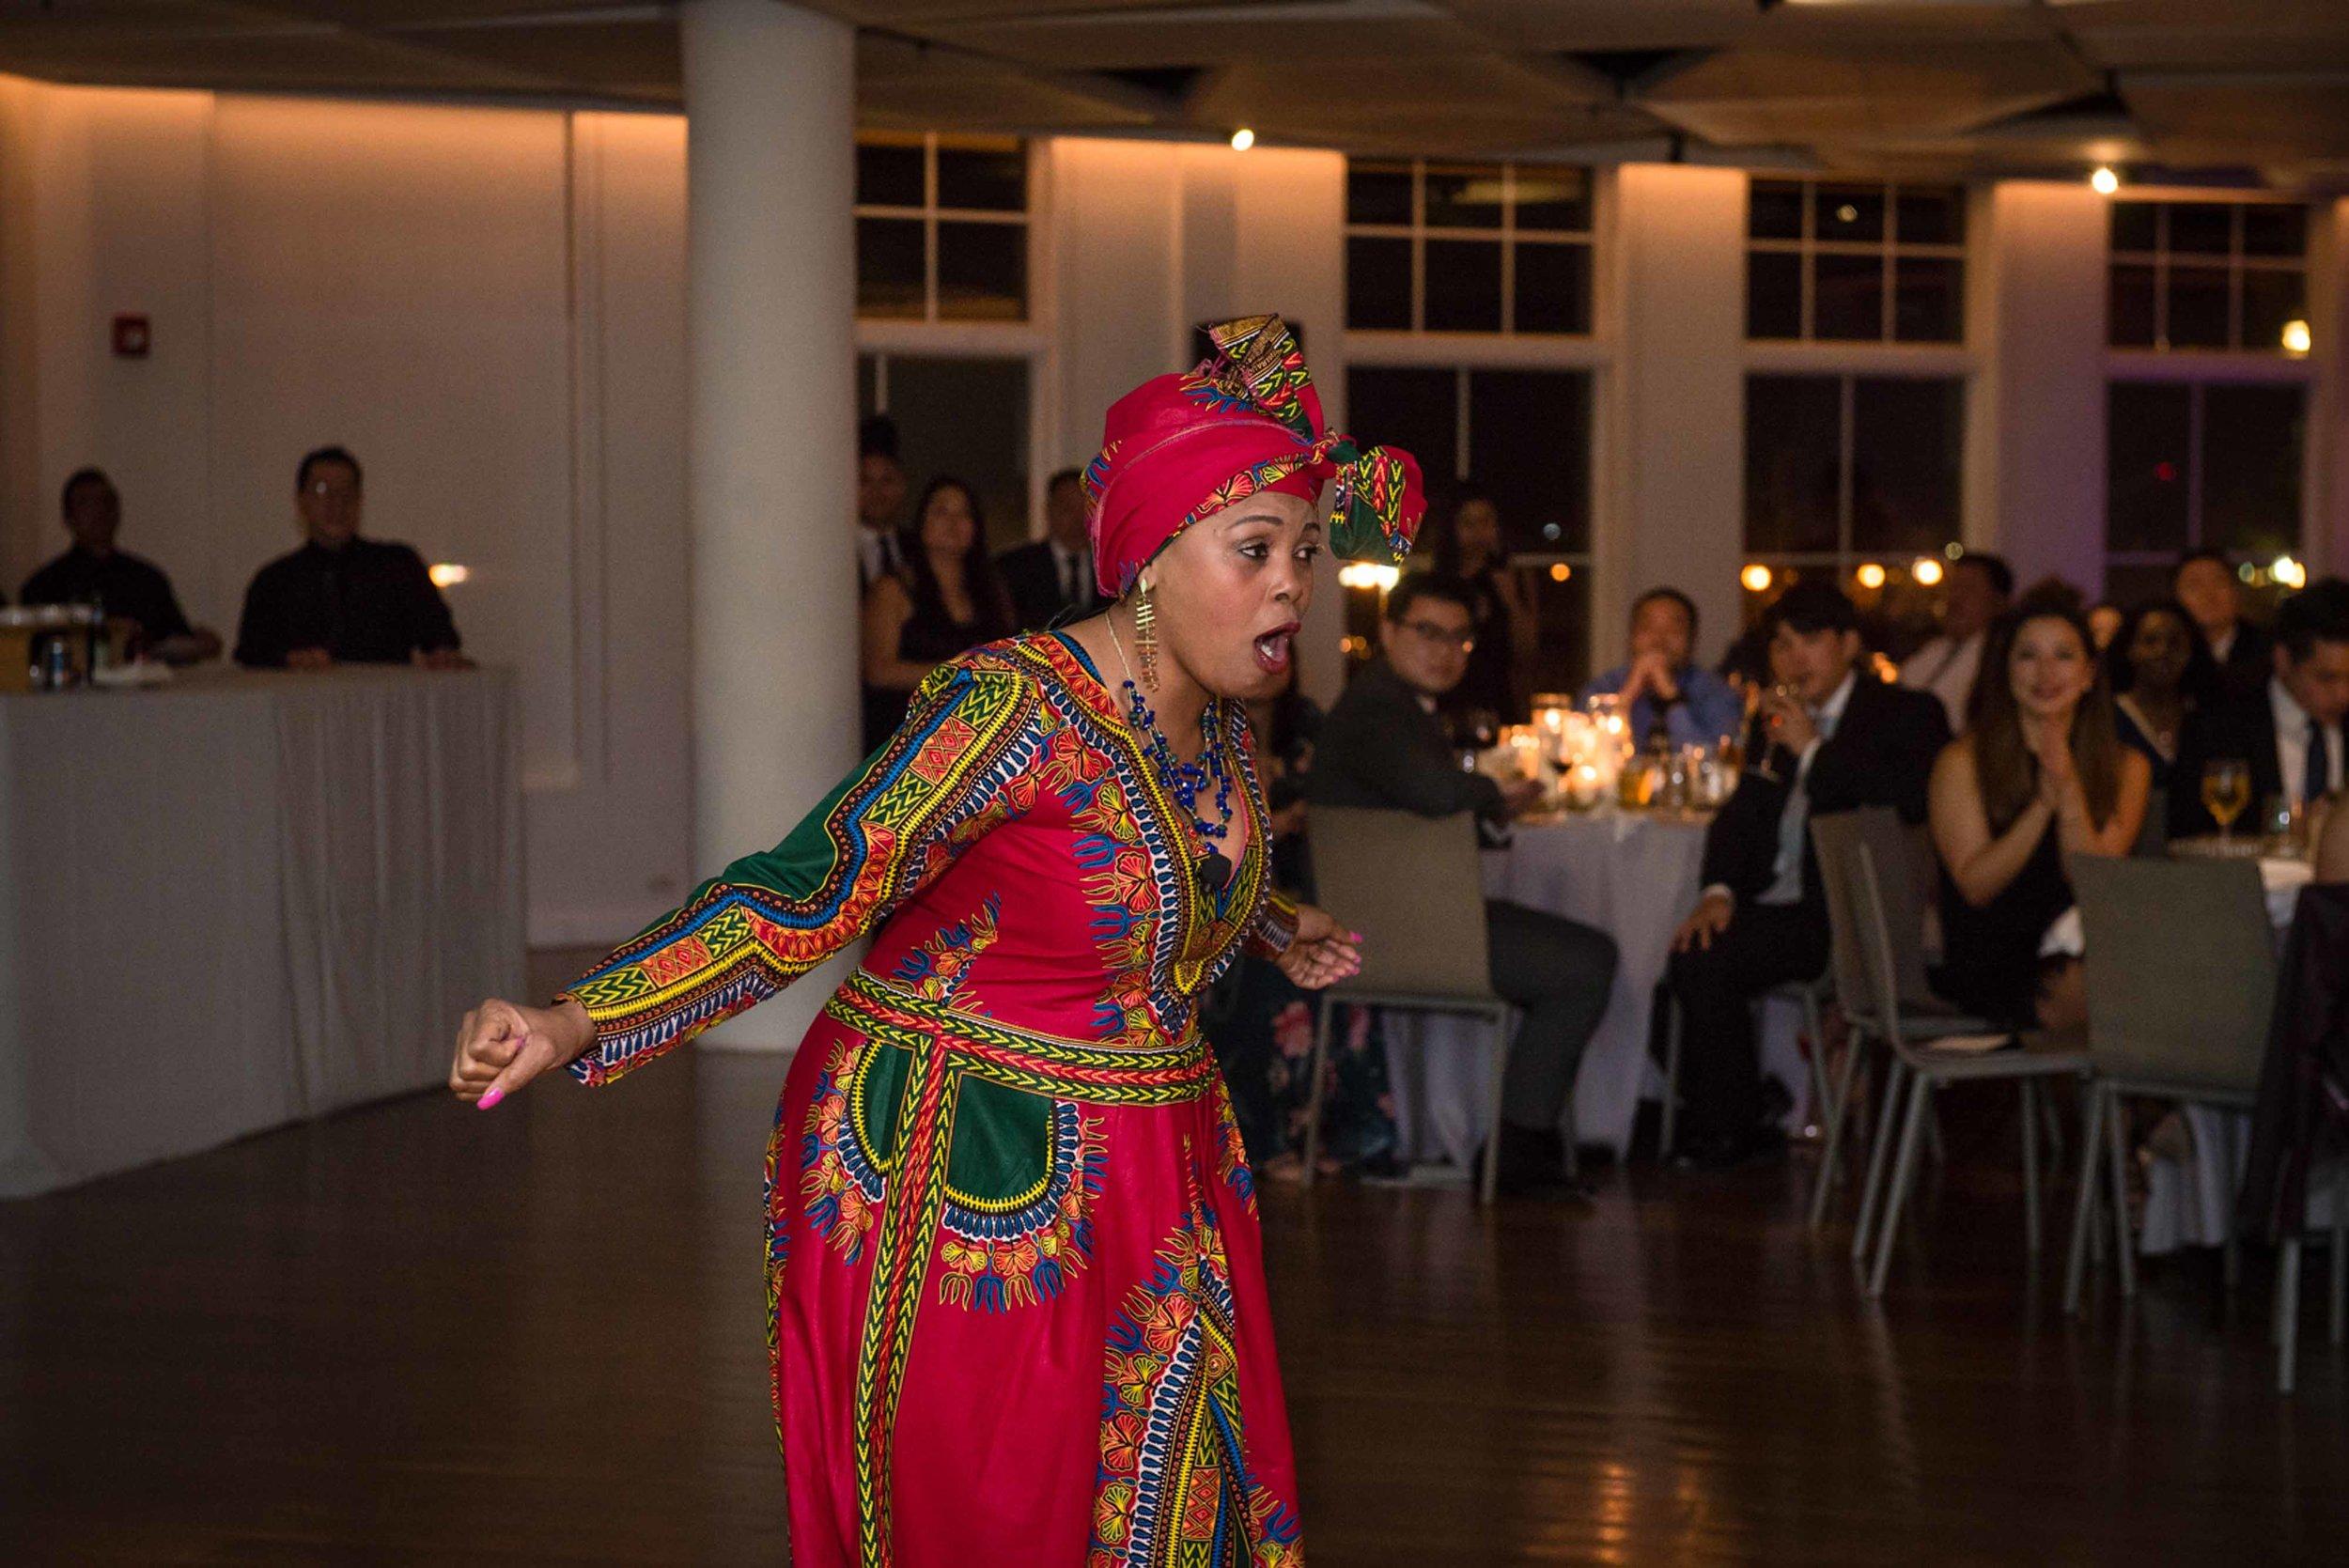 2017-10-21 Zimele USA 6th Annual Gala - Maritime Parc - Jersey City NJ_0245.jpg